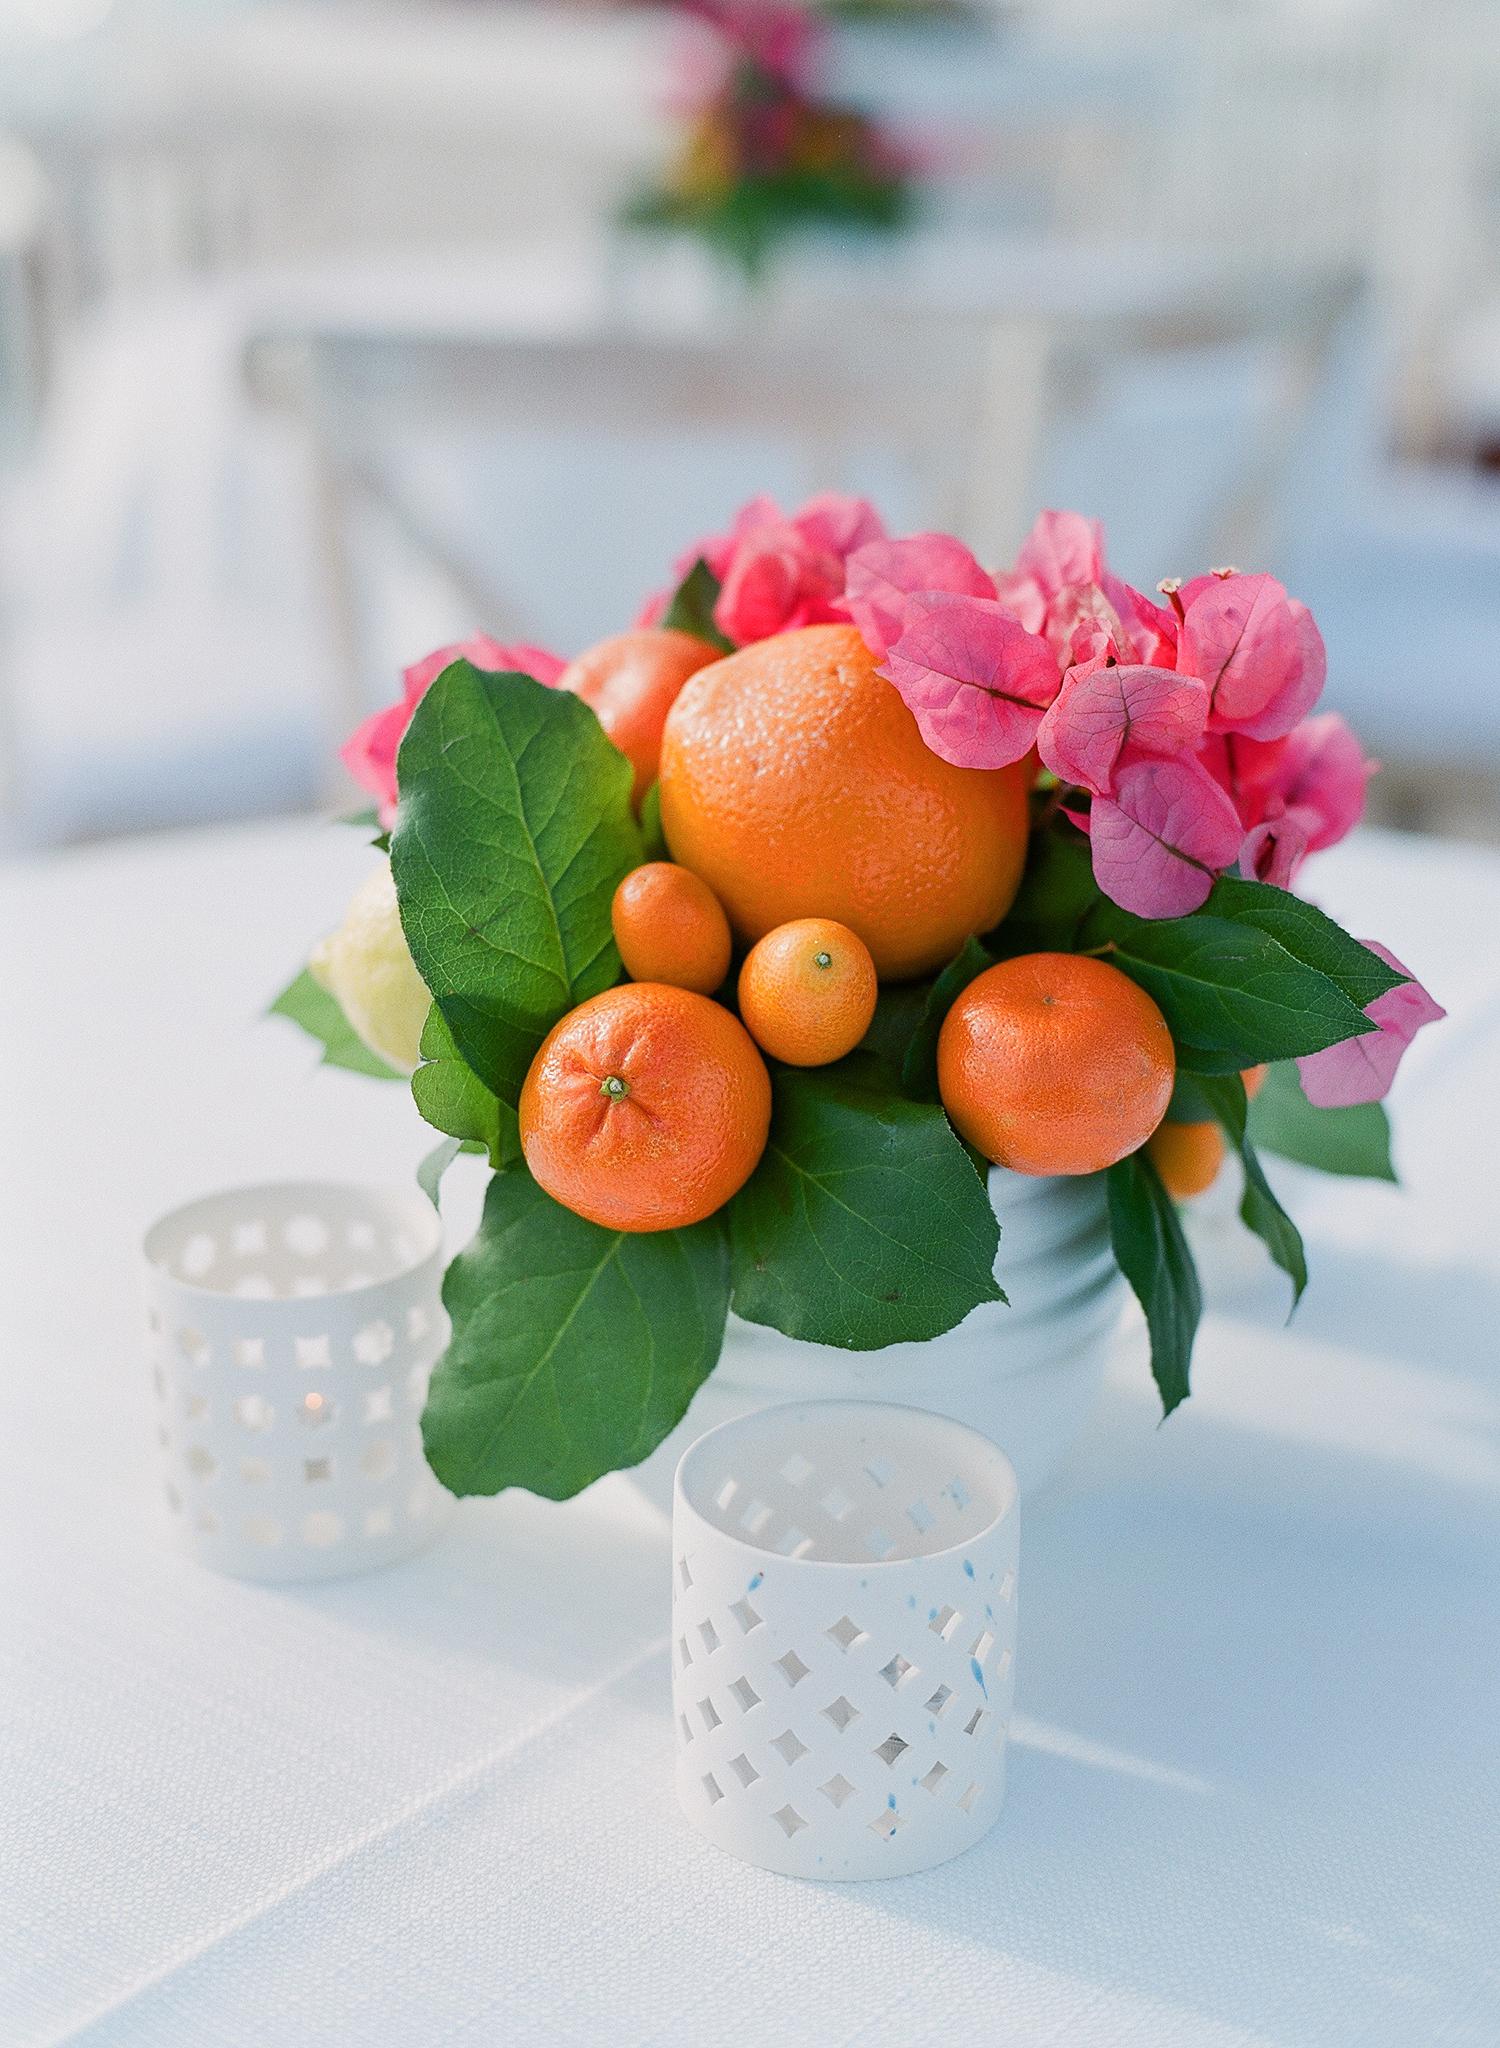 chelsea conor wedding welcome party citrus centerpiece